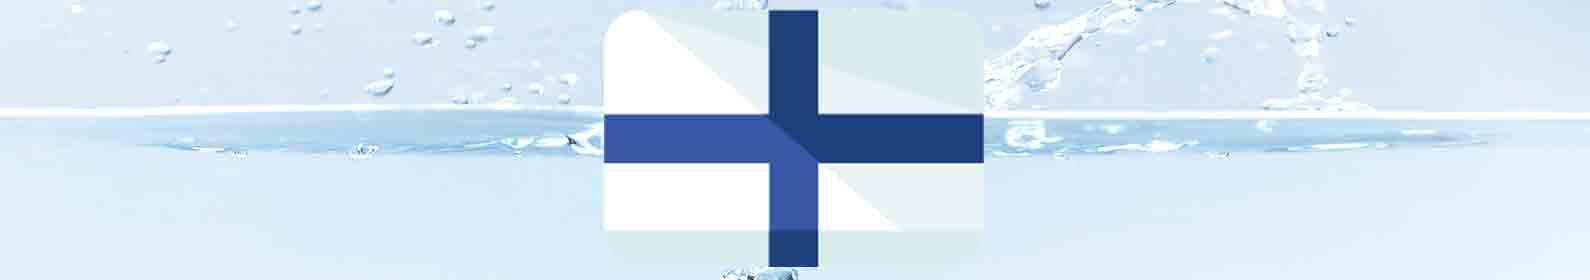 tratamento-de-agua-finlandia.jpg